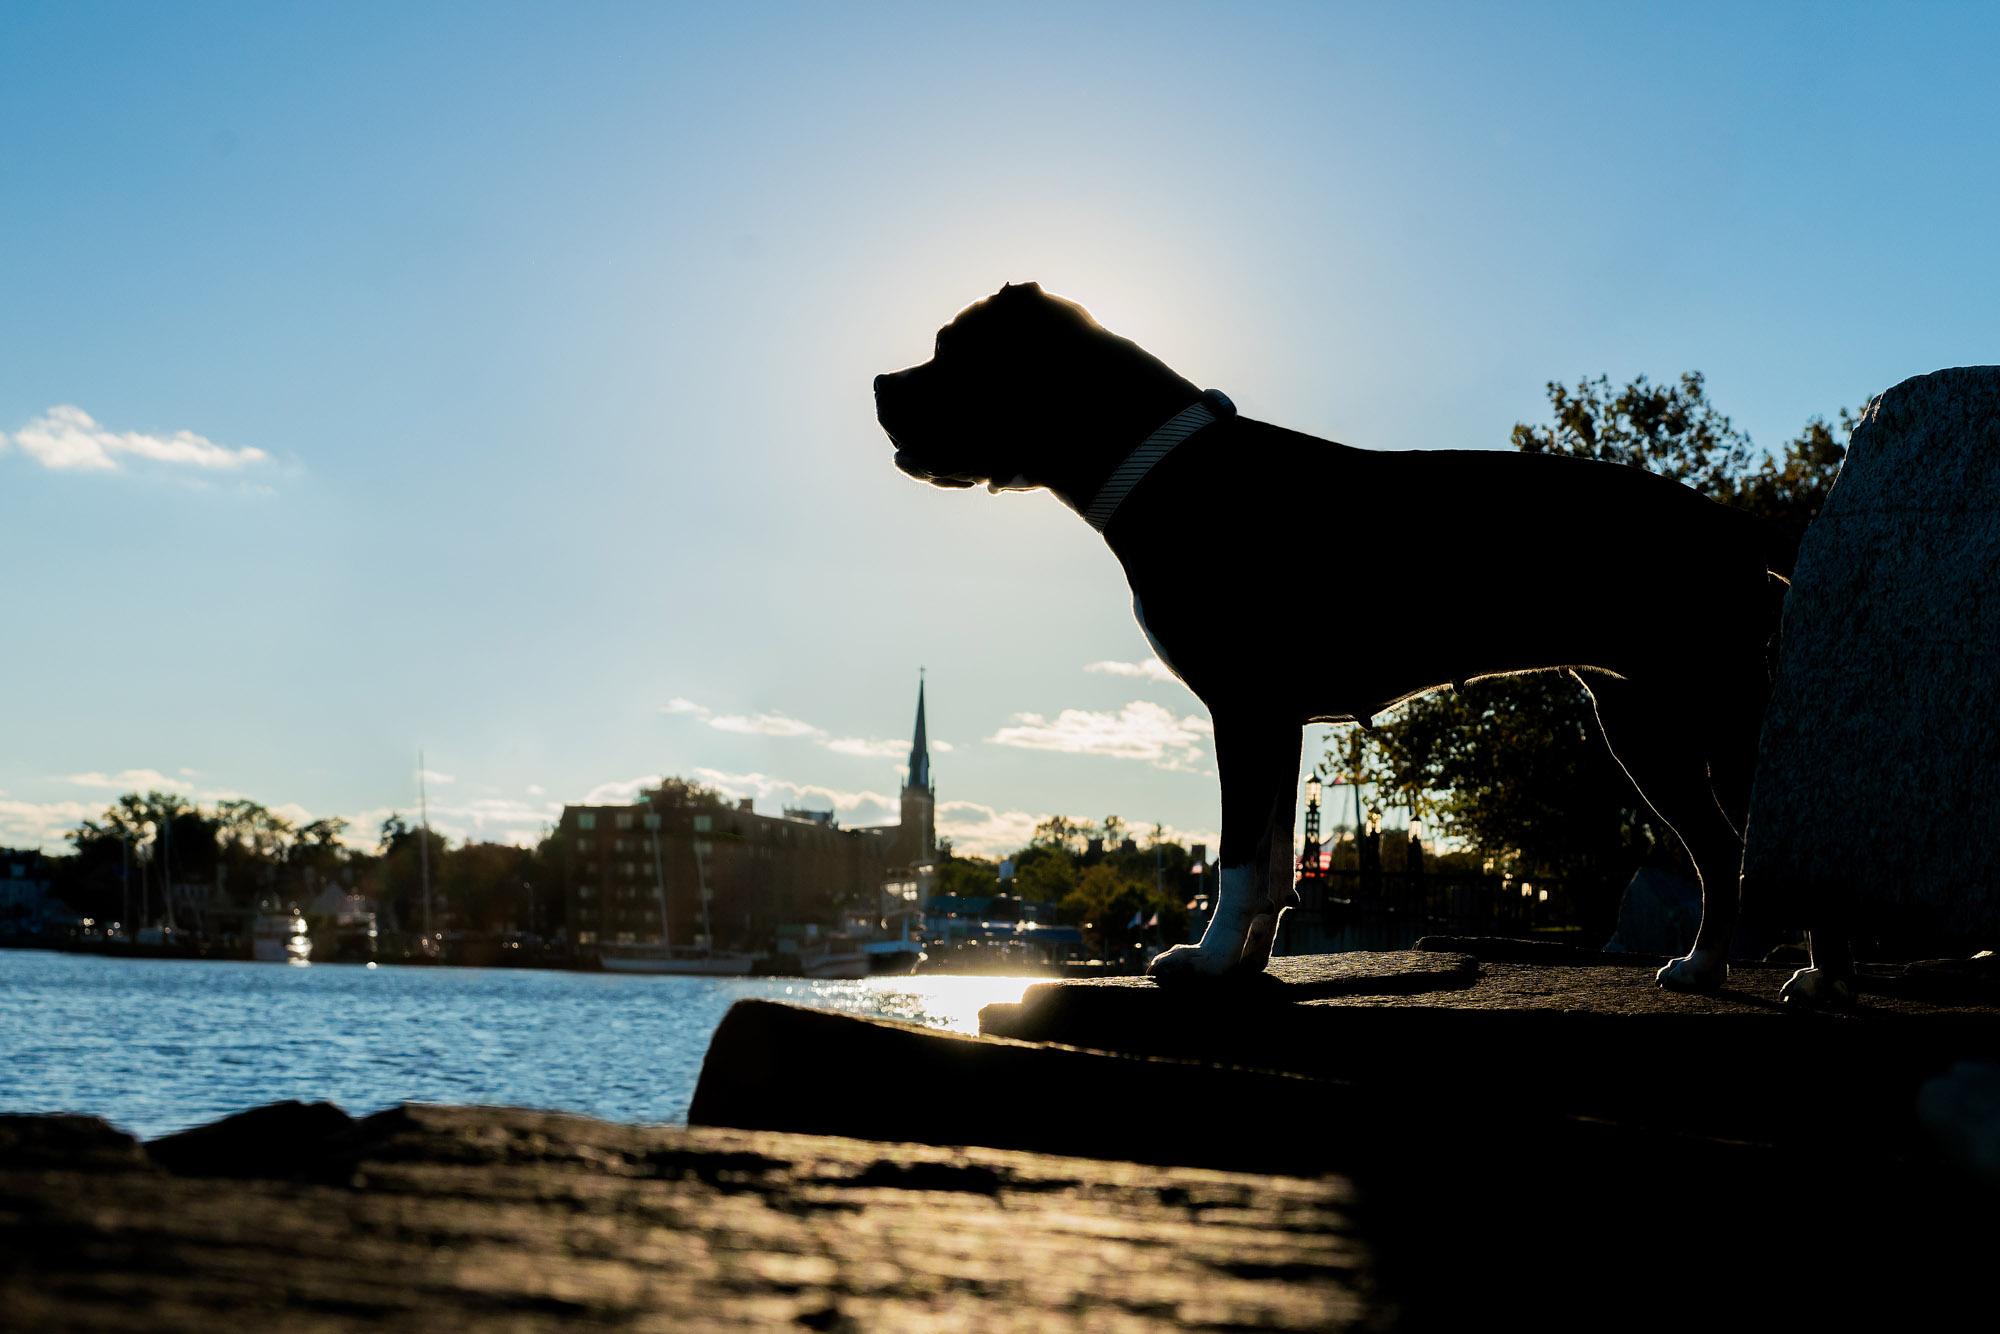 Silhouette of a dog near the ocean